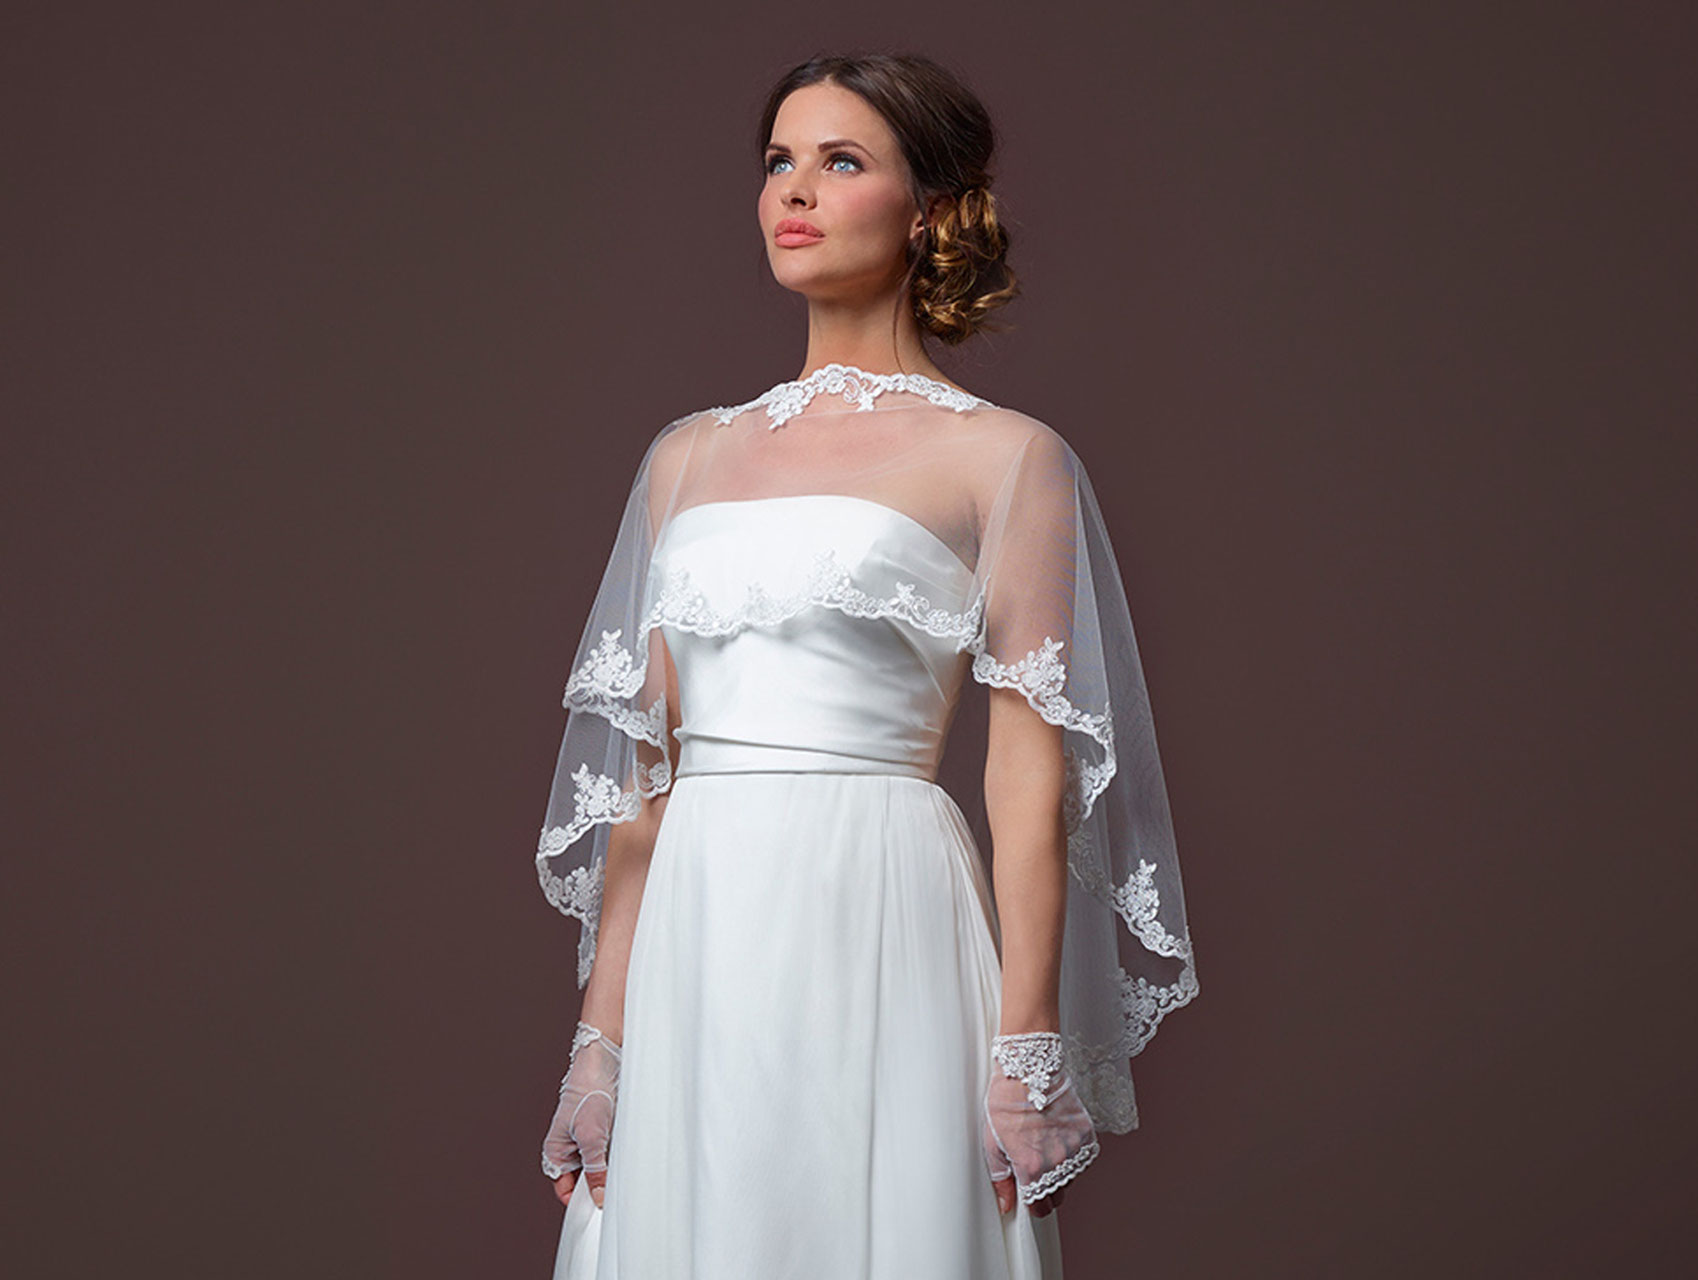 6359e8297d04e7 Sale bolero's/stola's - xsasashop: bruidsschoenen en bruidsaccessoires